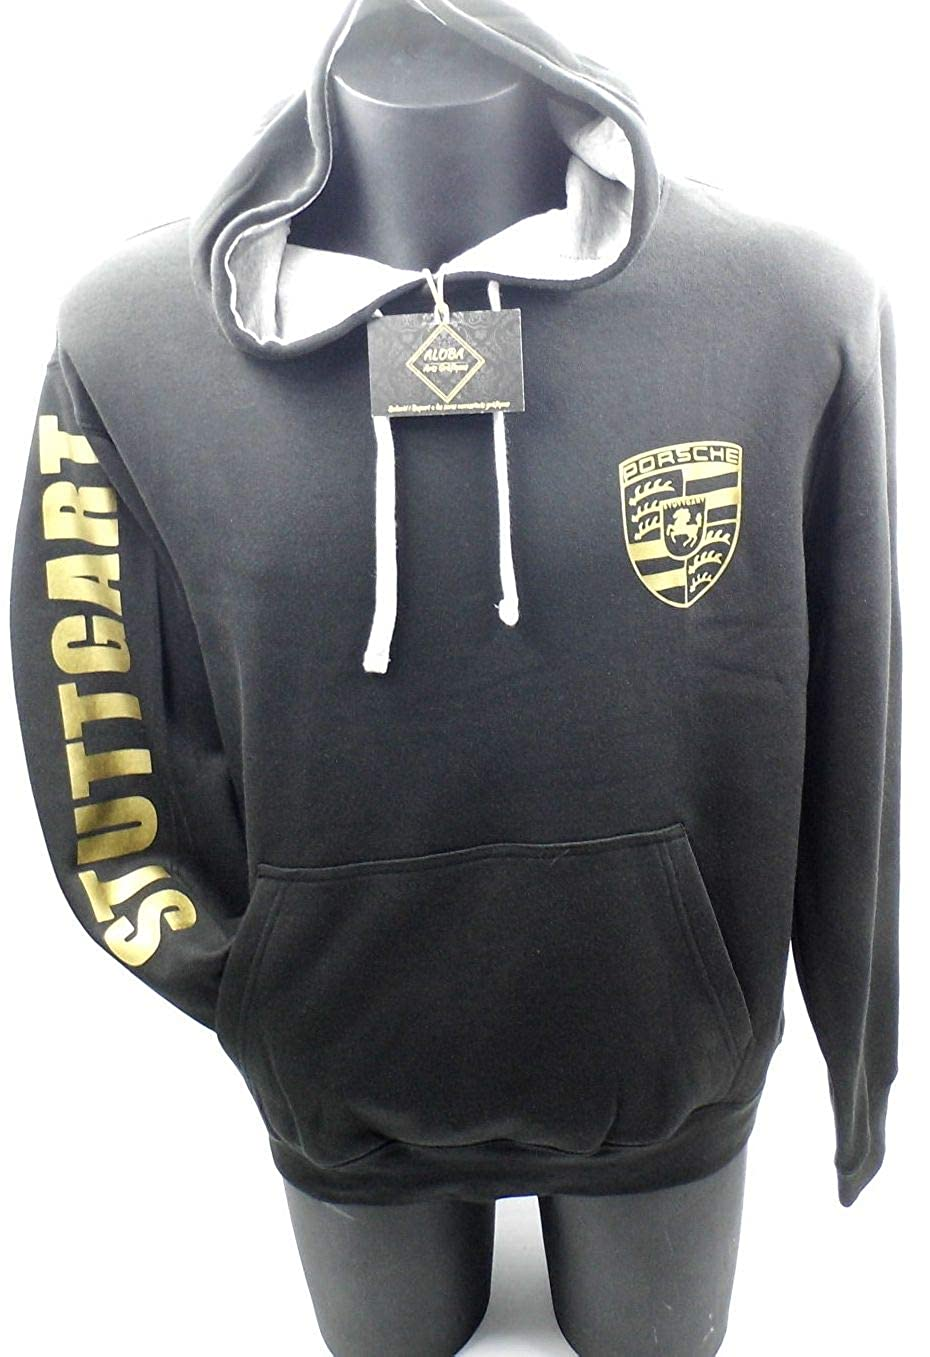 ALOBA Porsche Stuttgart Sweatshirt, Gute Qualität Gold Effect, komplett in Europa hergestellt, europäische Größe